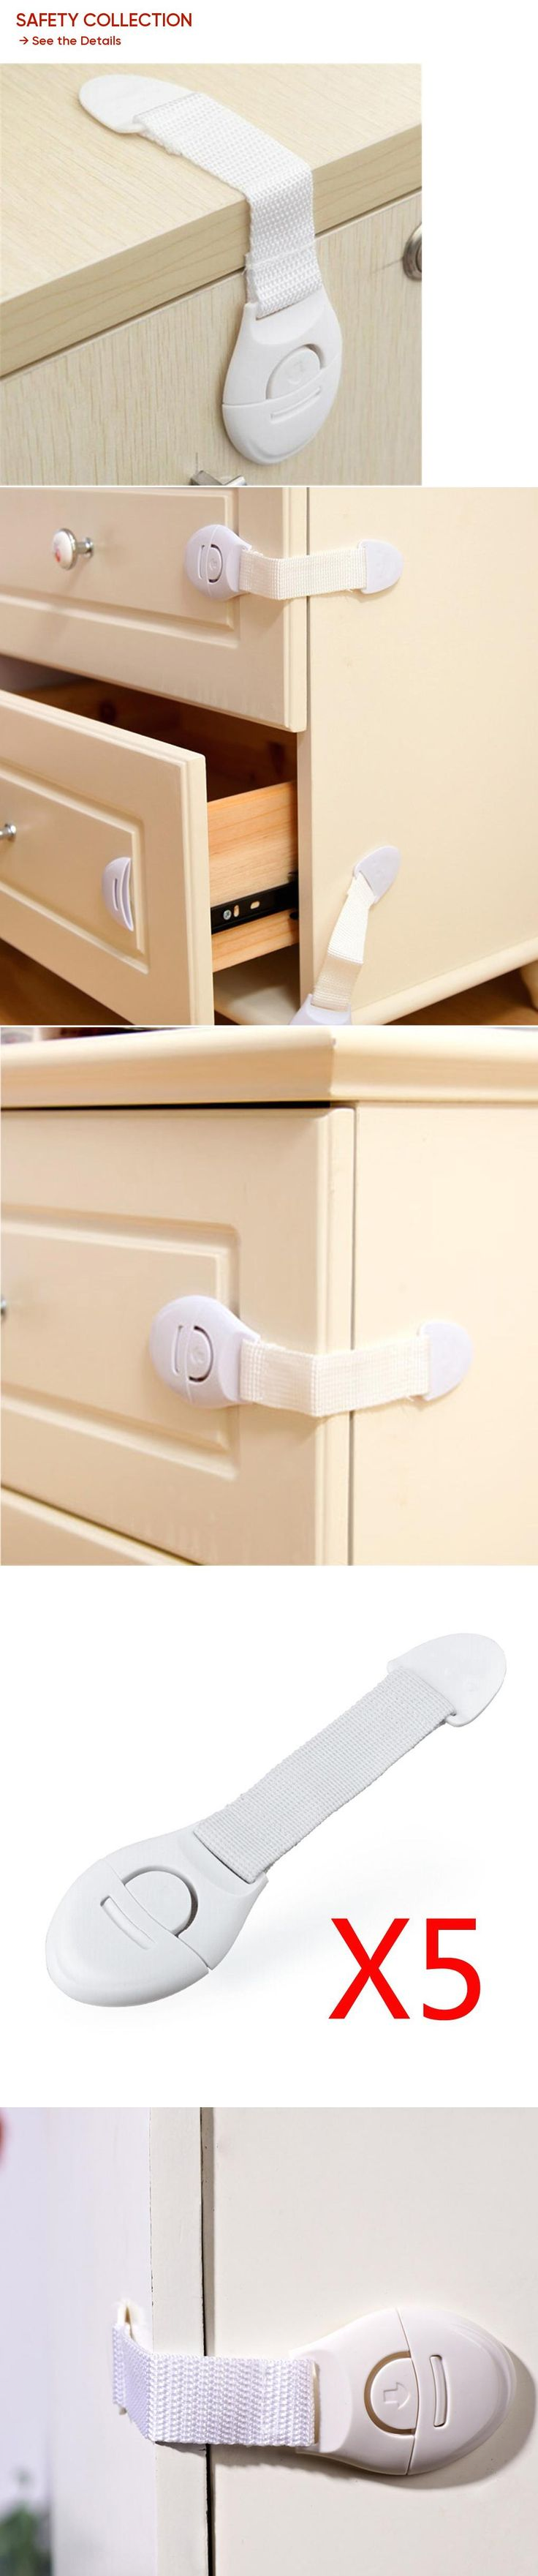 5Pcs/Lot Baby Safety Child Lock Plastic Drawer Door